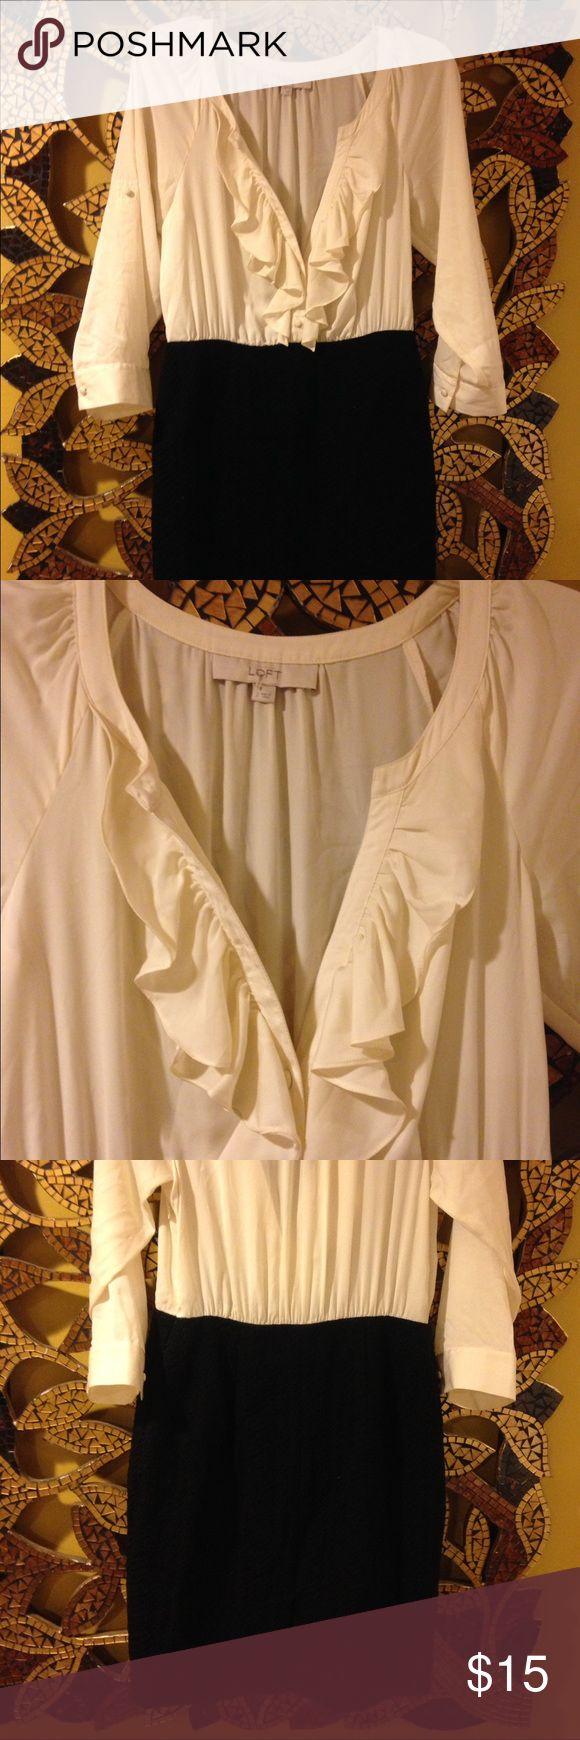 Ann Taylor Loft Dress Ann Taylor Loft Dress Size 2 Ann Taylor LOFT Dresses Midi